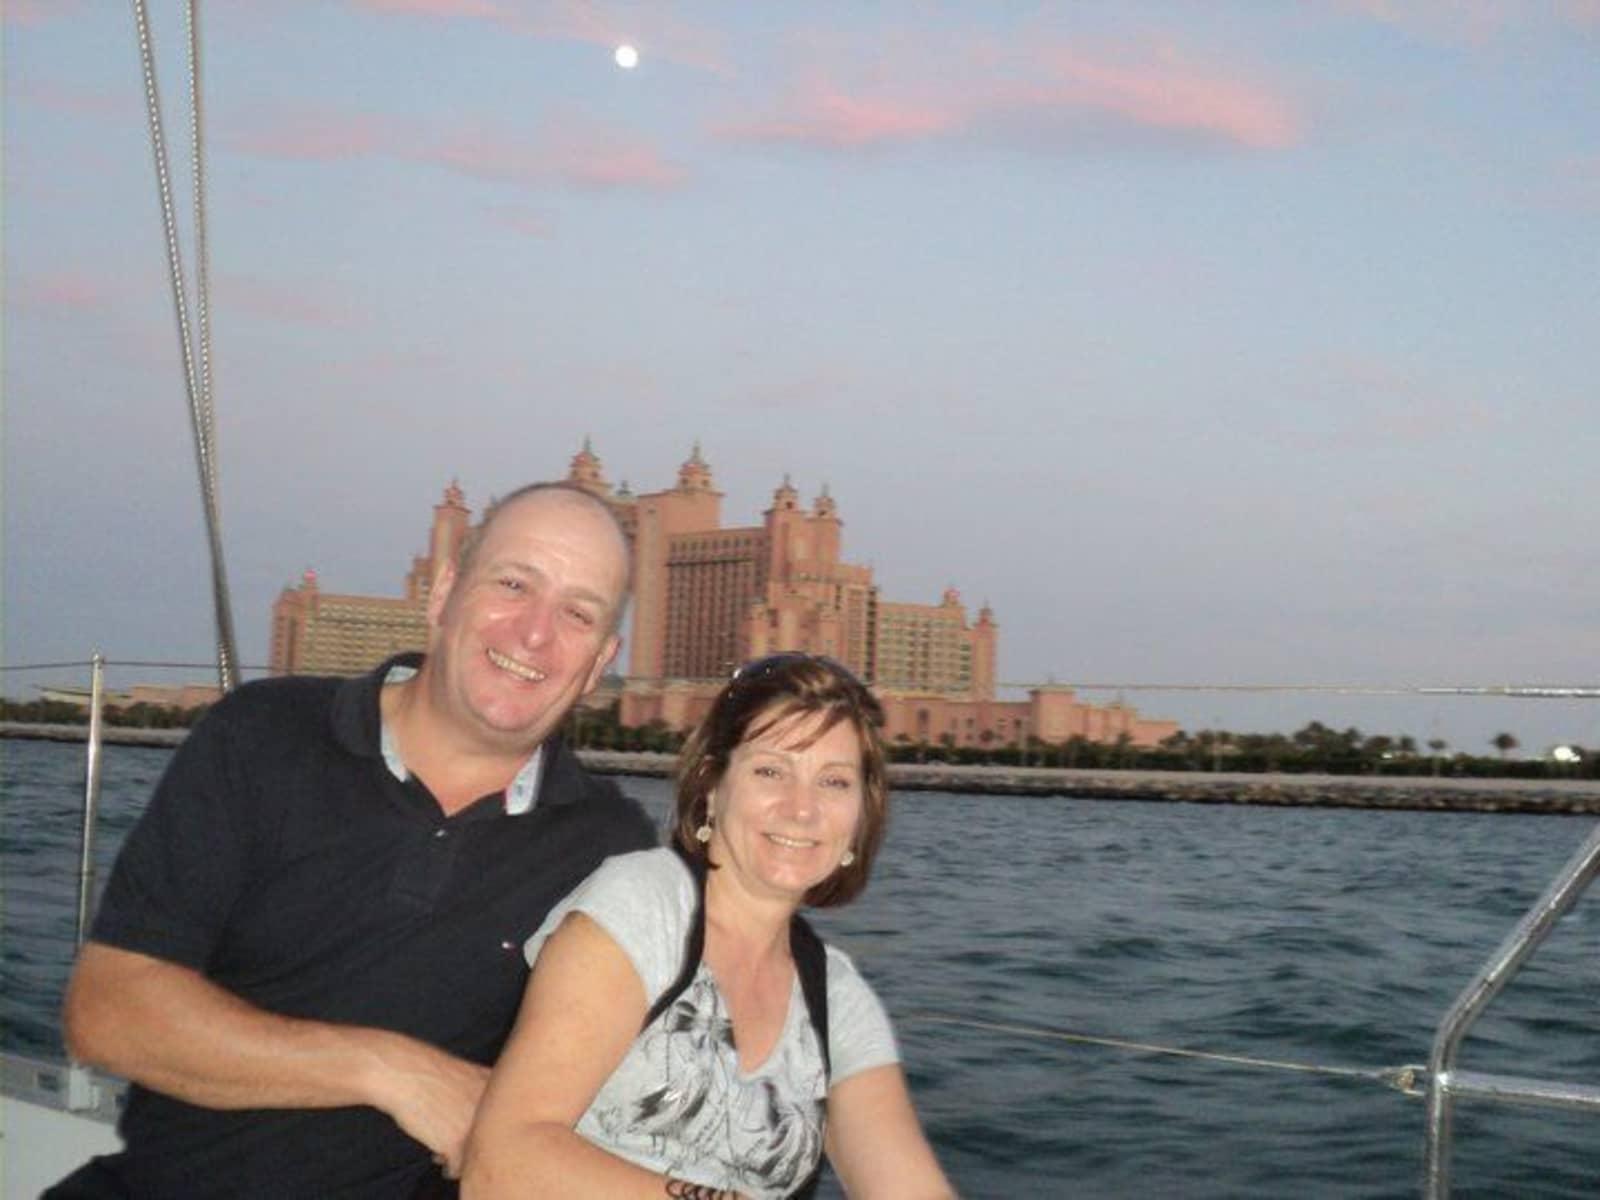 Denise & Ian from Hermanus, South Africa